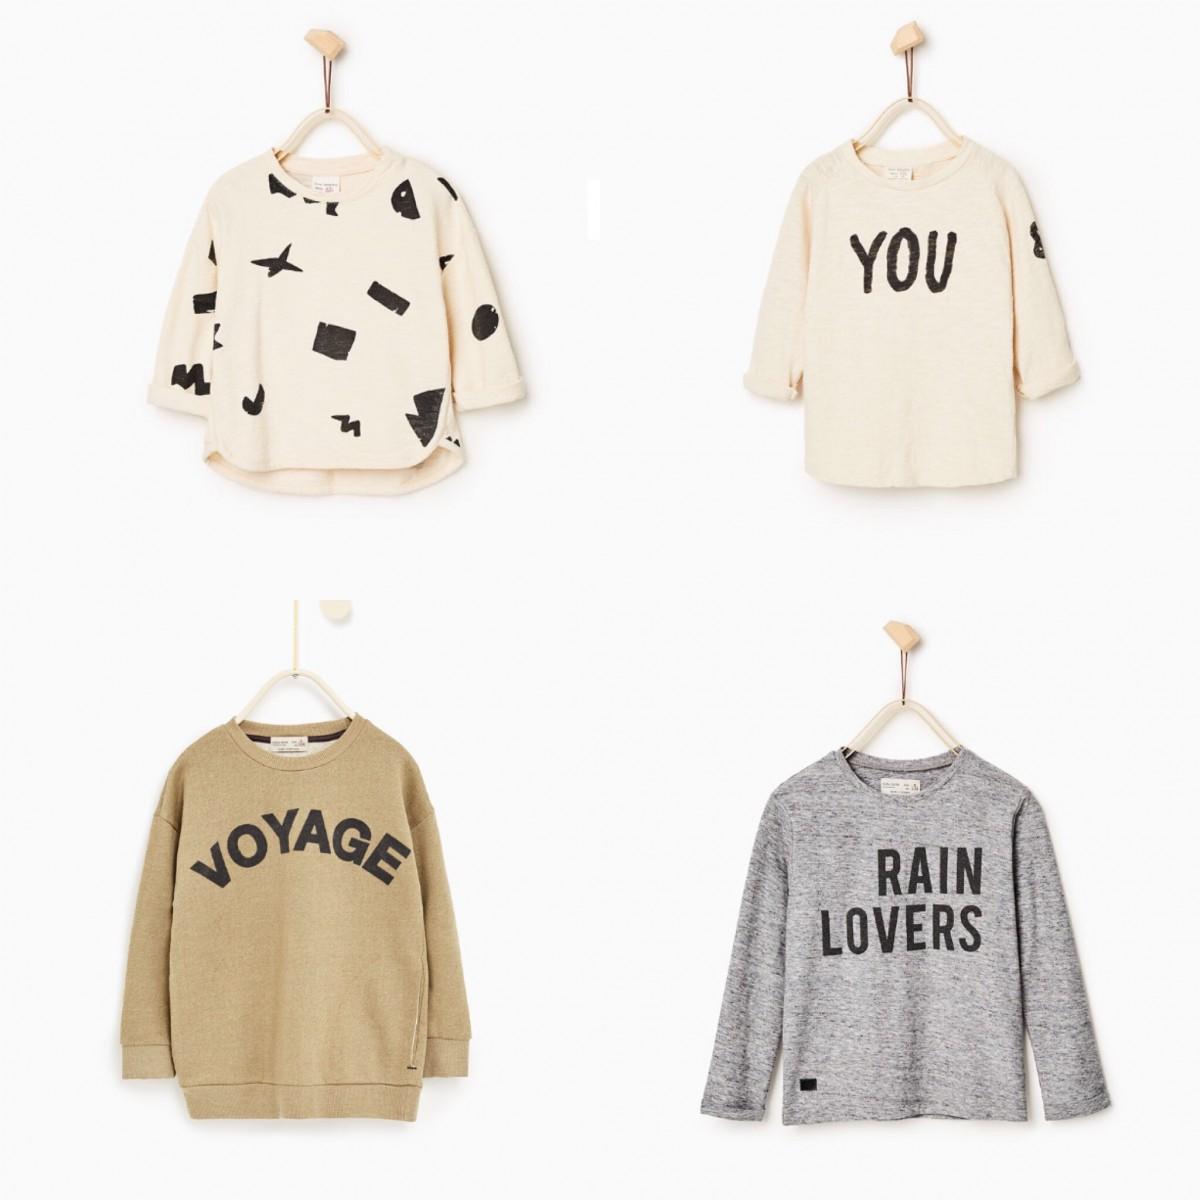 308555b7574 Clock wise from top left: Geometric Printed Plus Sweater £9.99, You & Me Top  £8.99, Rain Lovers Top £8.99, Voyage Sweatshirt £14.99